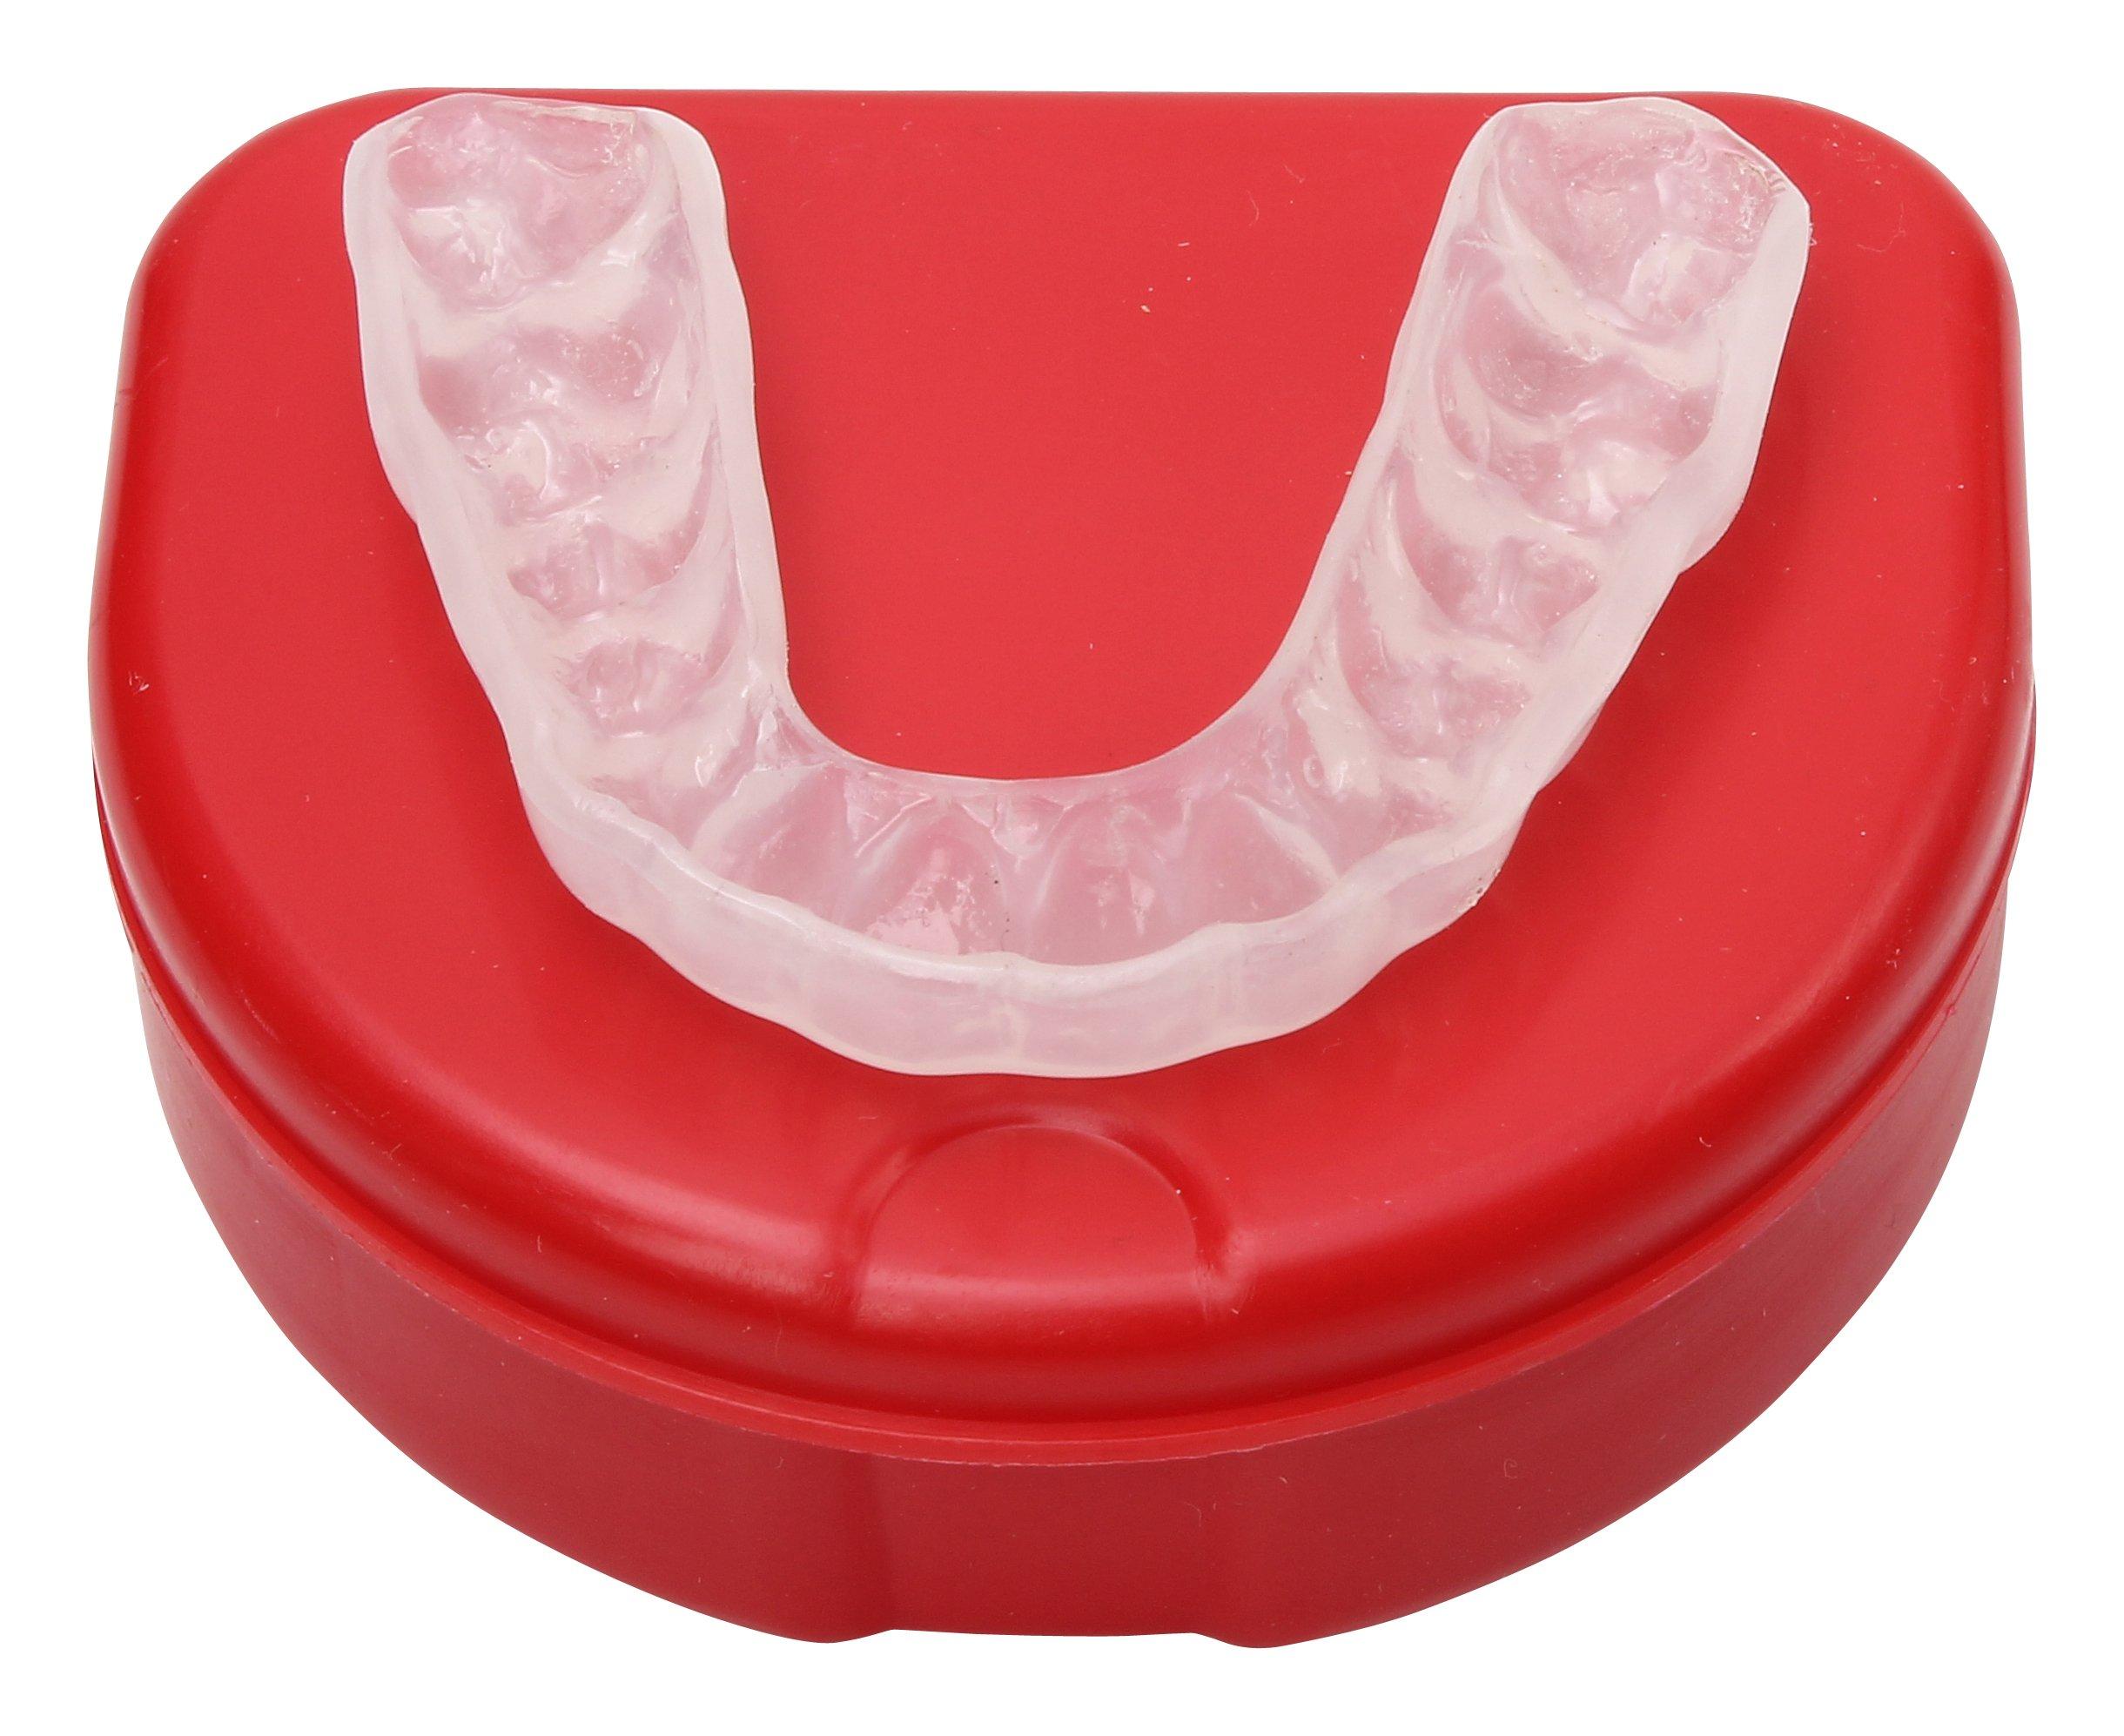 Custom Flexible Super Hard Dental Night Teeth Guard (Splint for Bruxism) by SportingSmiles (Image #1)